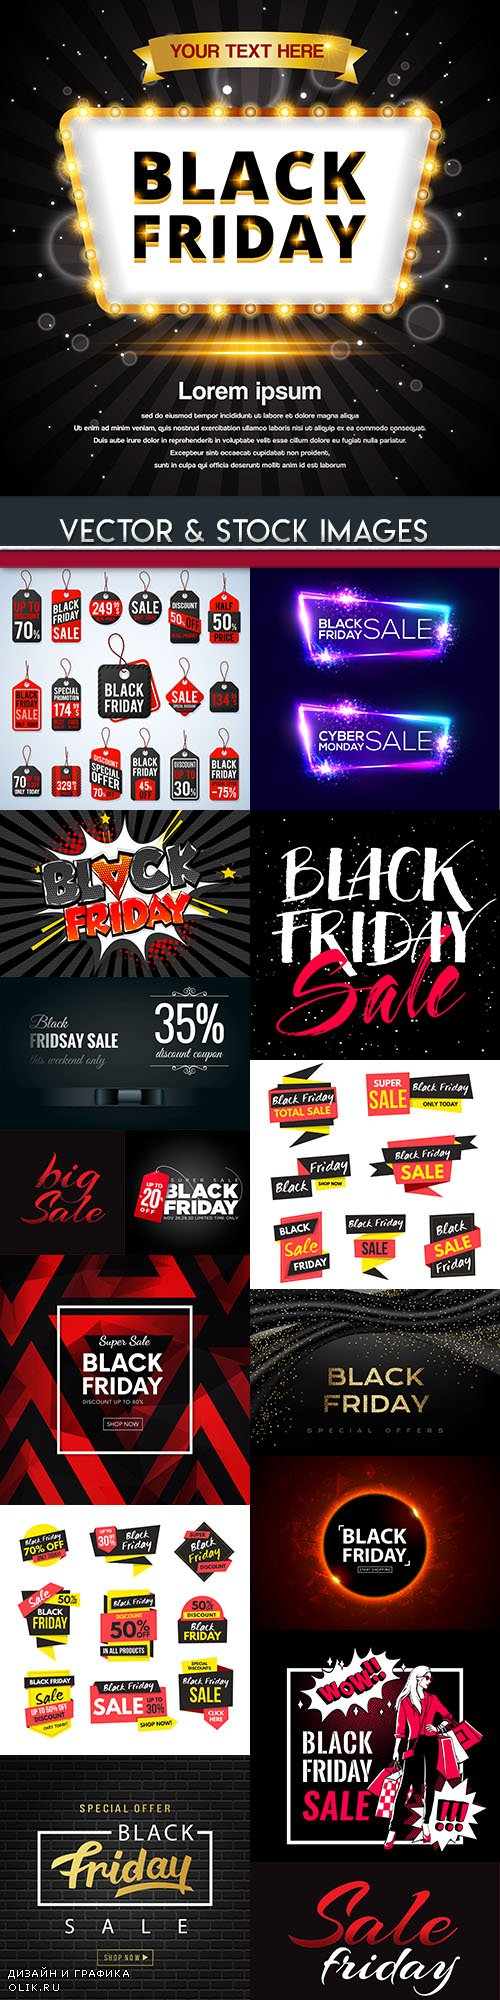 Black Friday and sale special design illustration 22